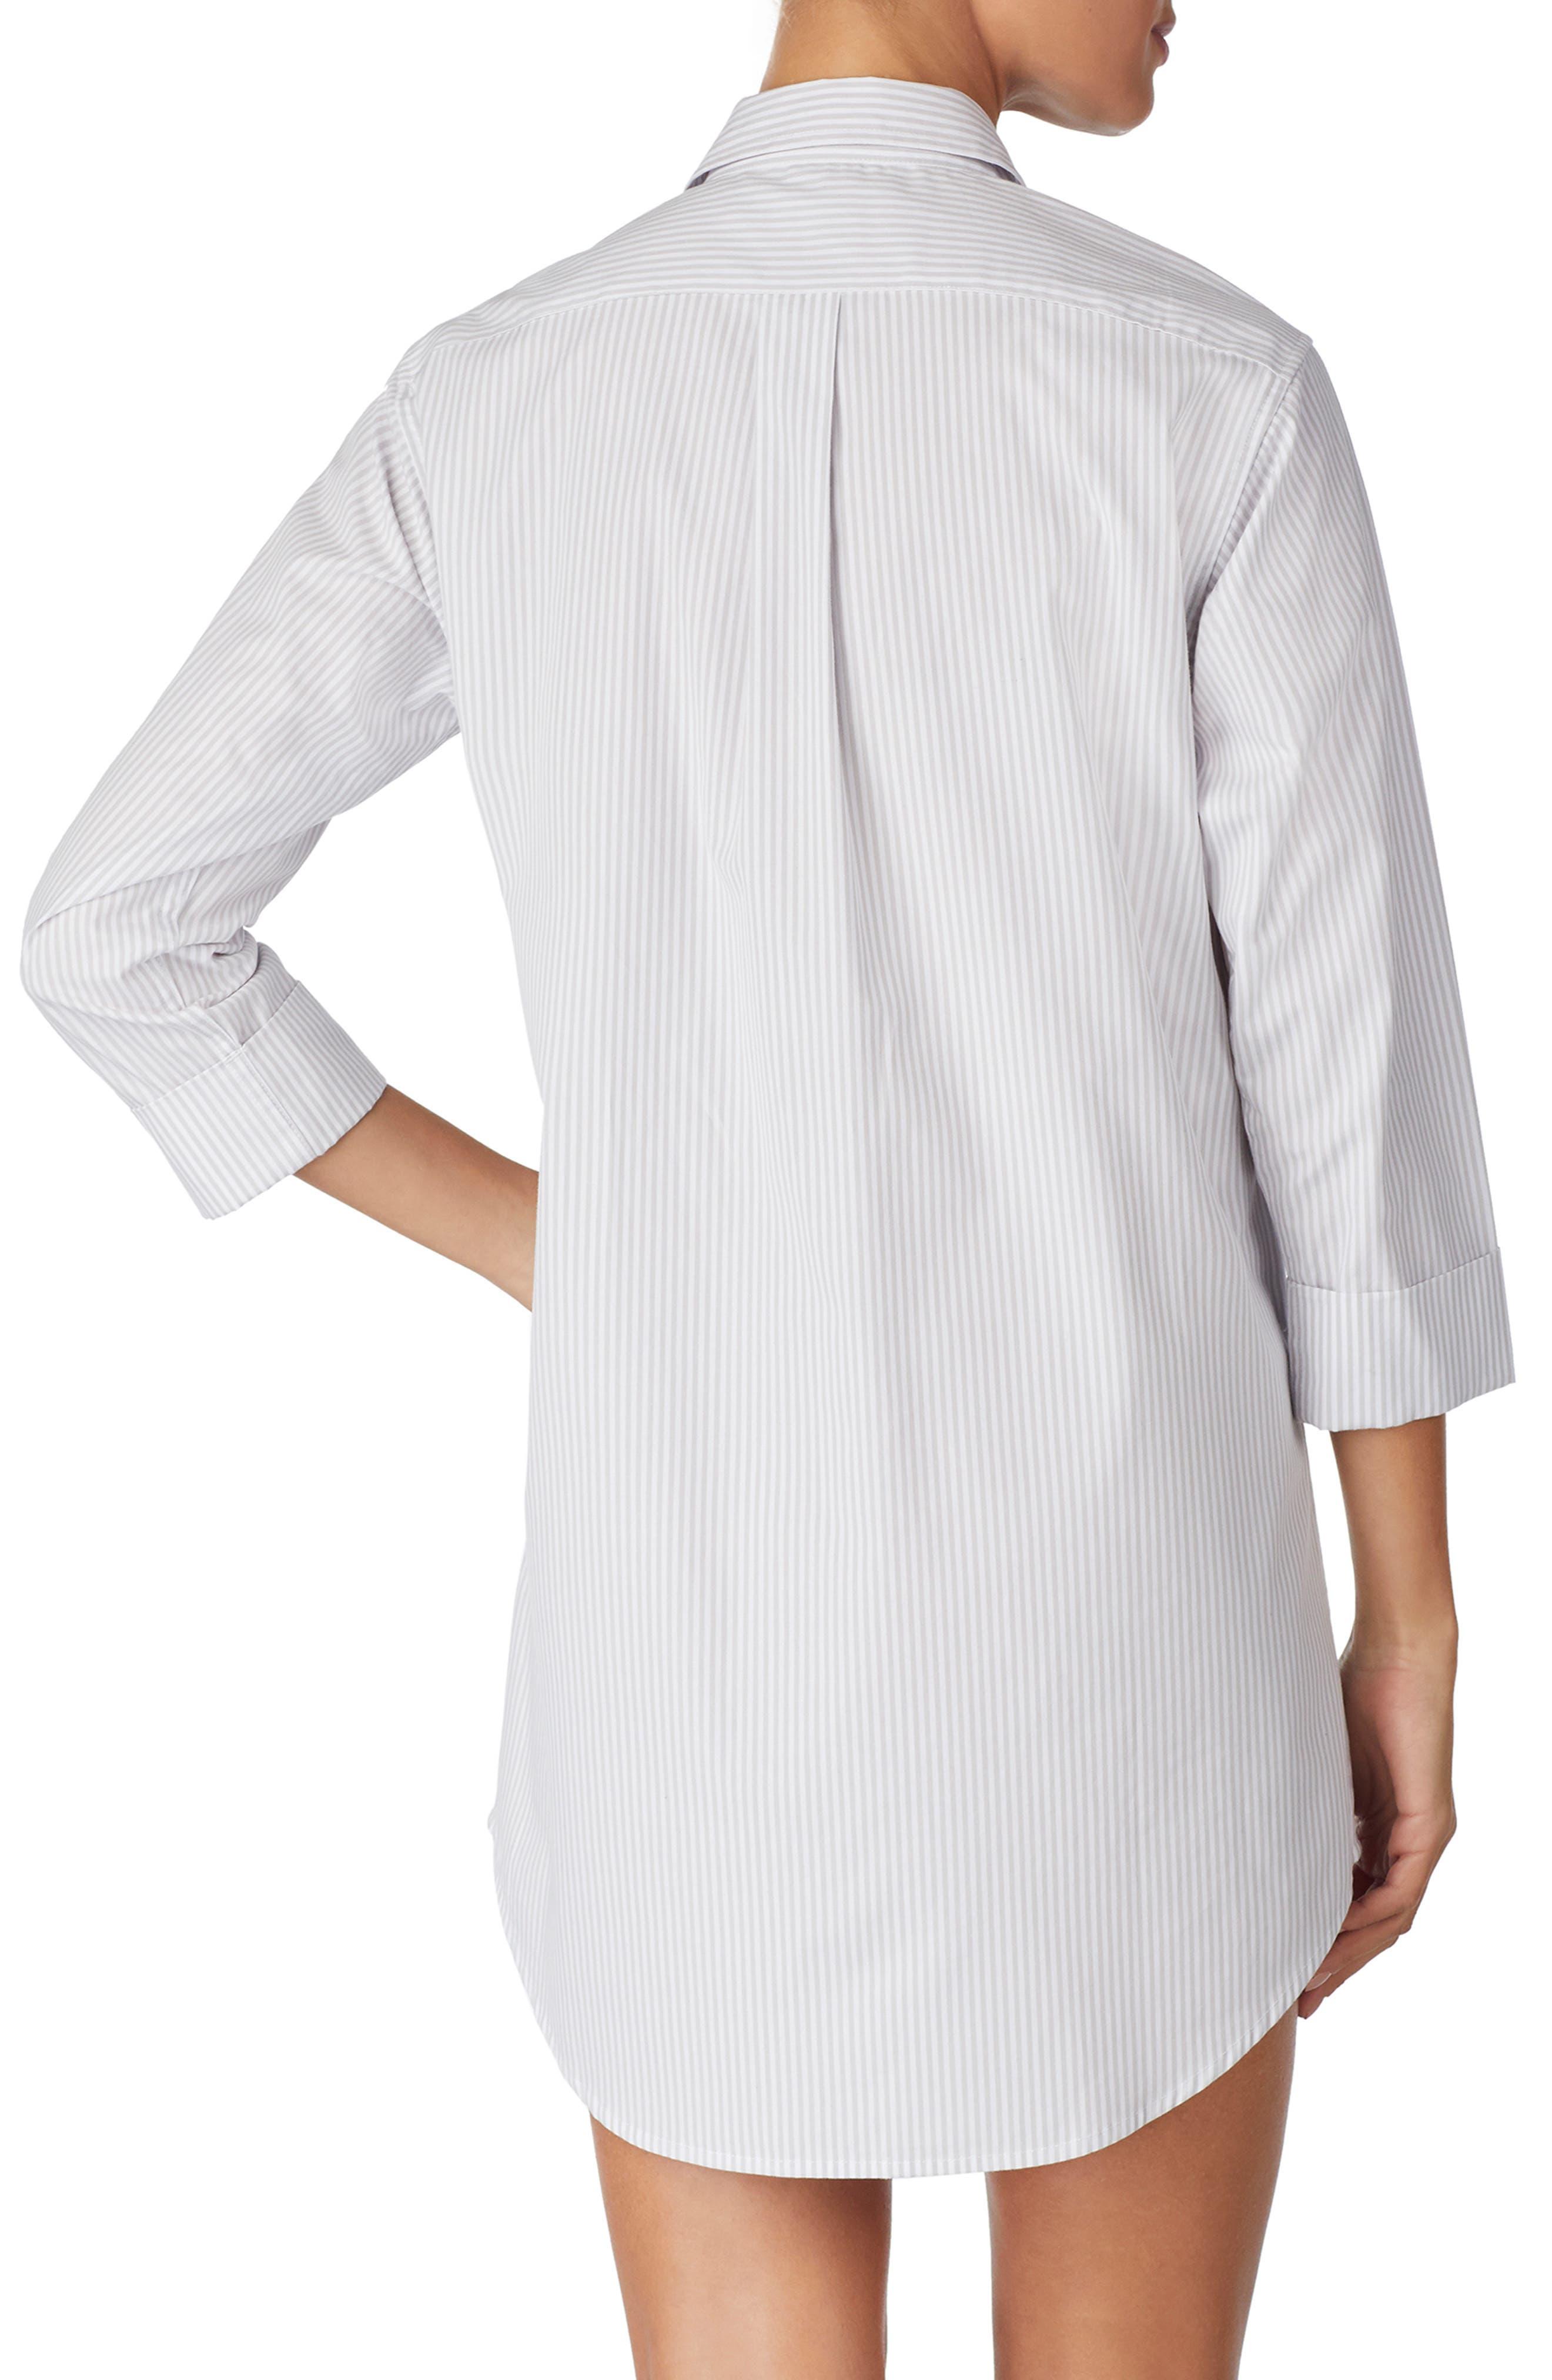 LAUREN RALPH LAUREN, Cotton Poplin Sleep Shirt, Alternate thumbnail 2, color, GREY